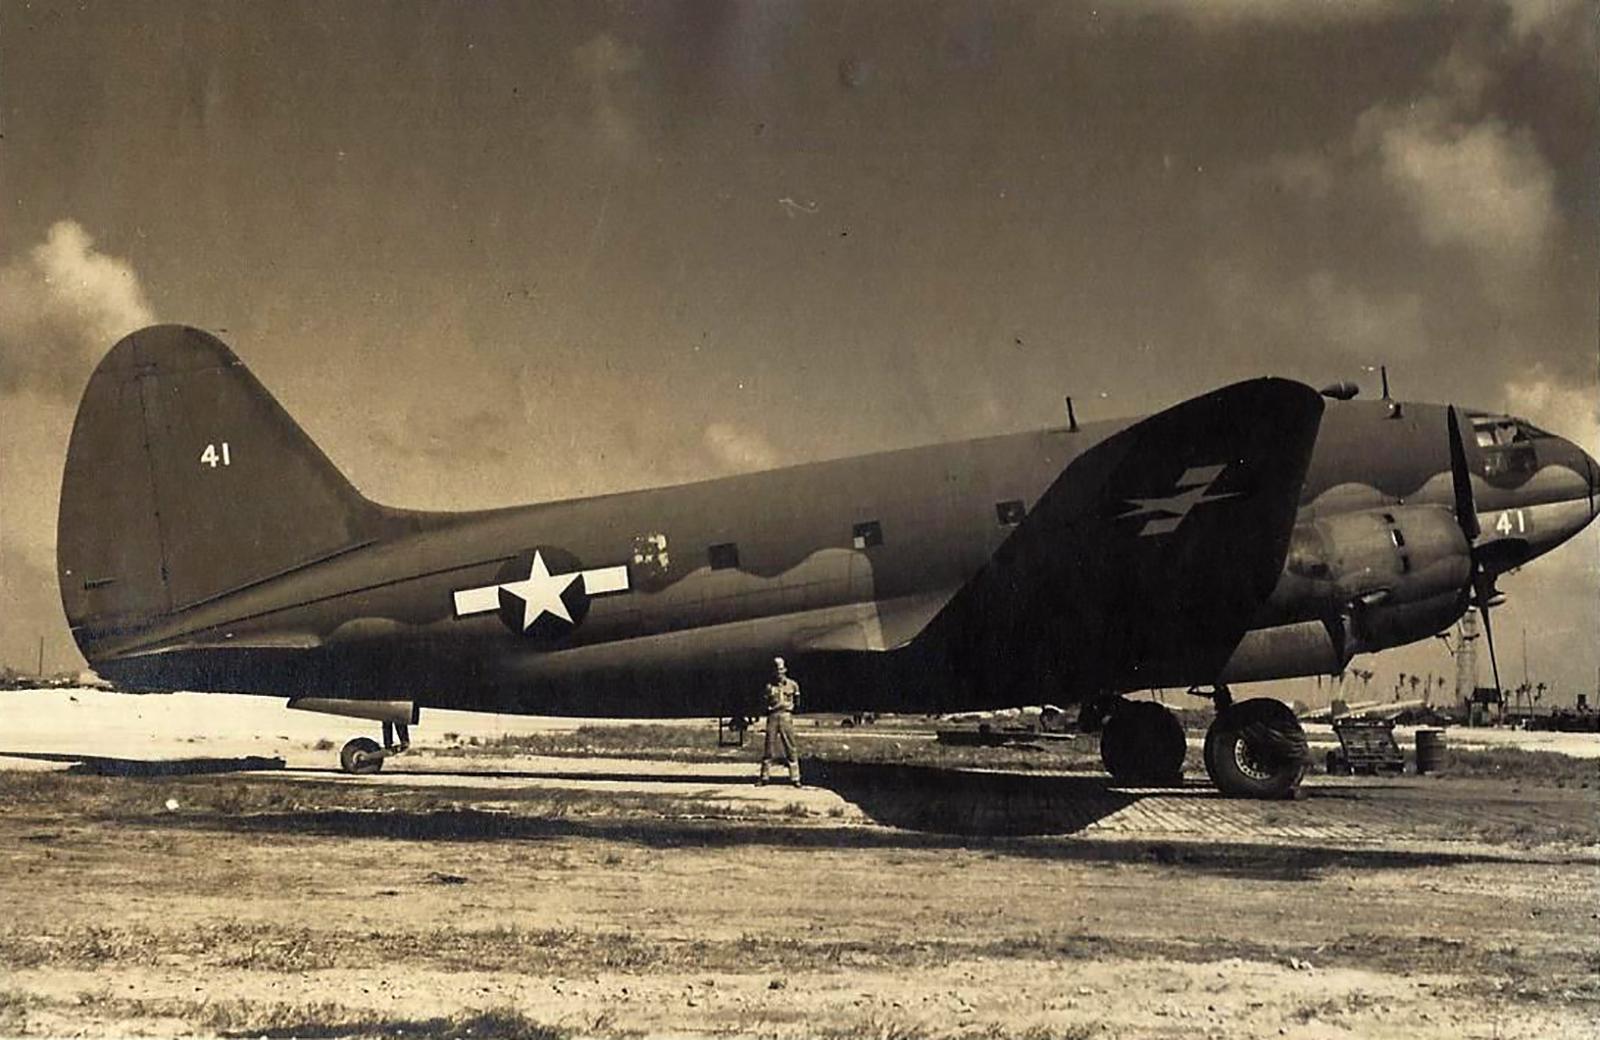 Curtiss C 46 Commando White 41 at Kwajalein 1945 01